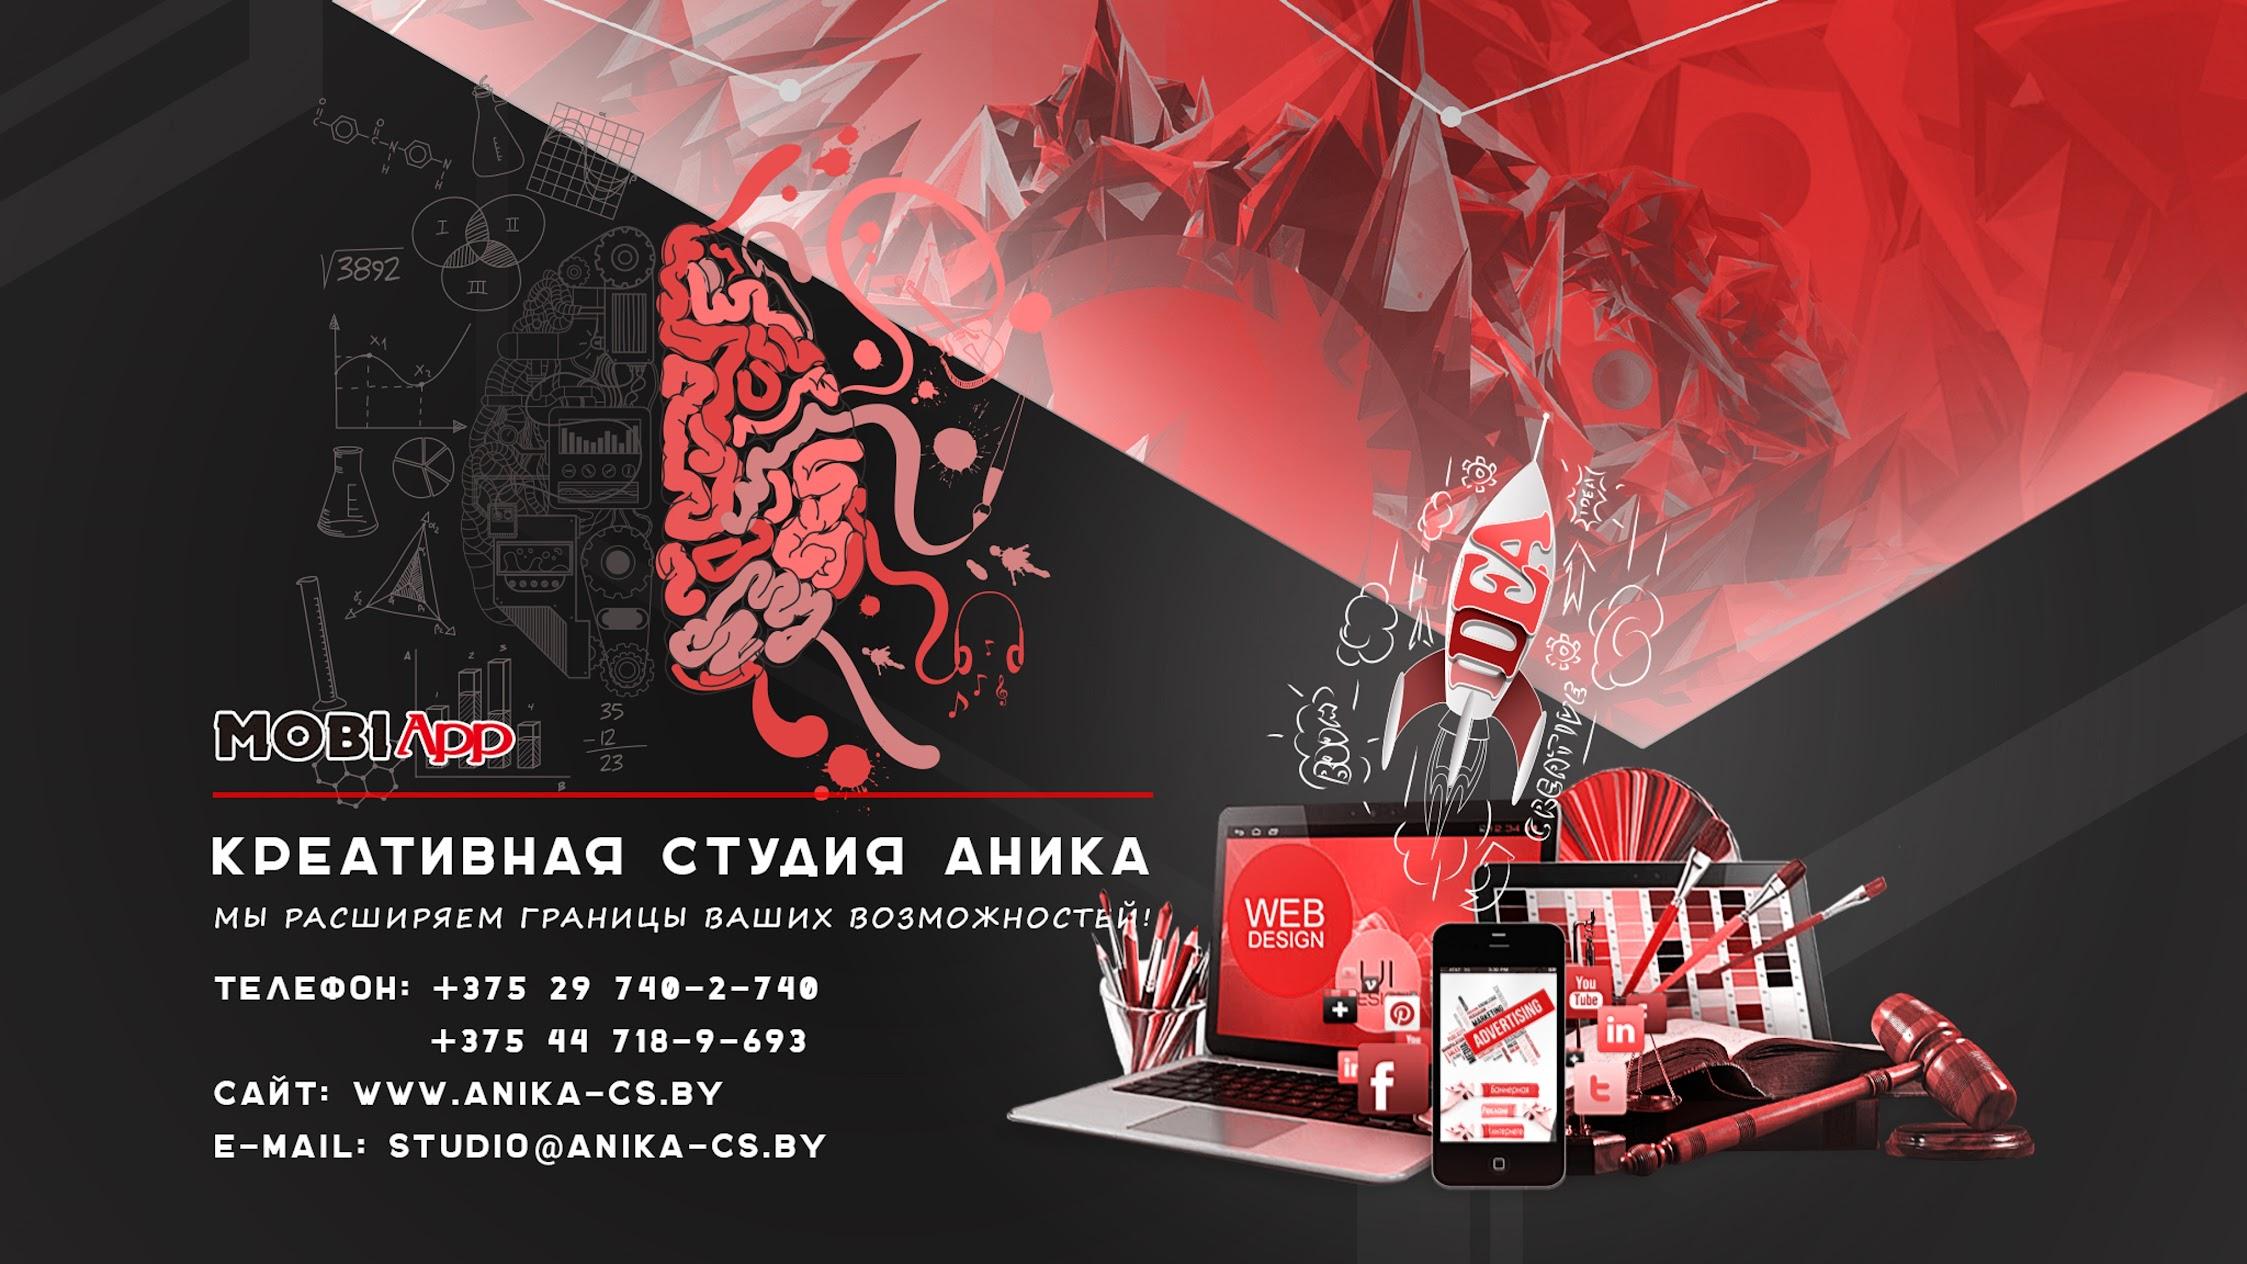 LLC Creative studio AnikA